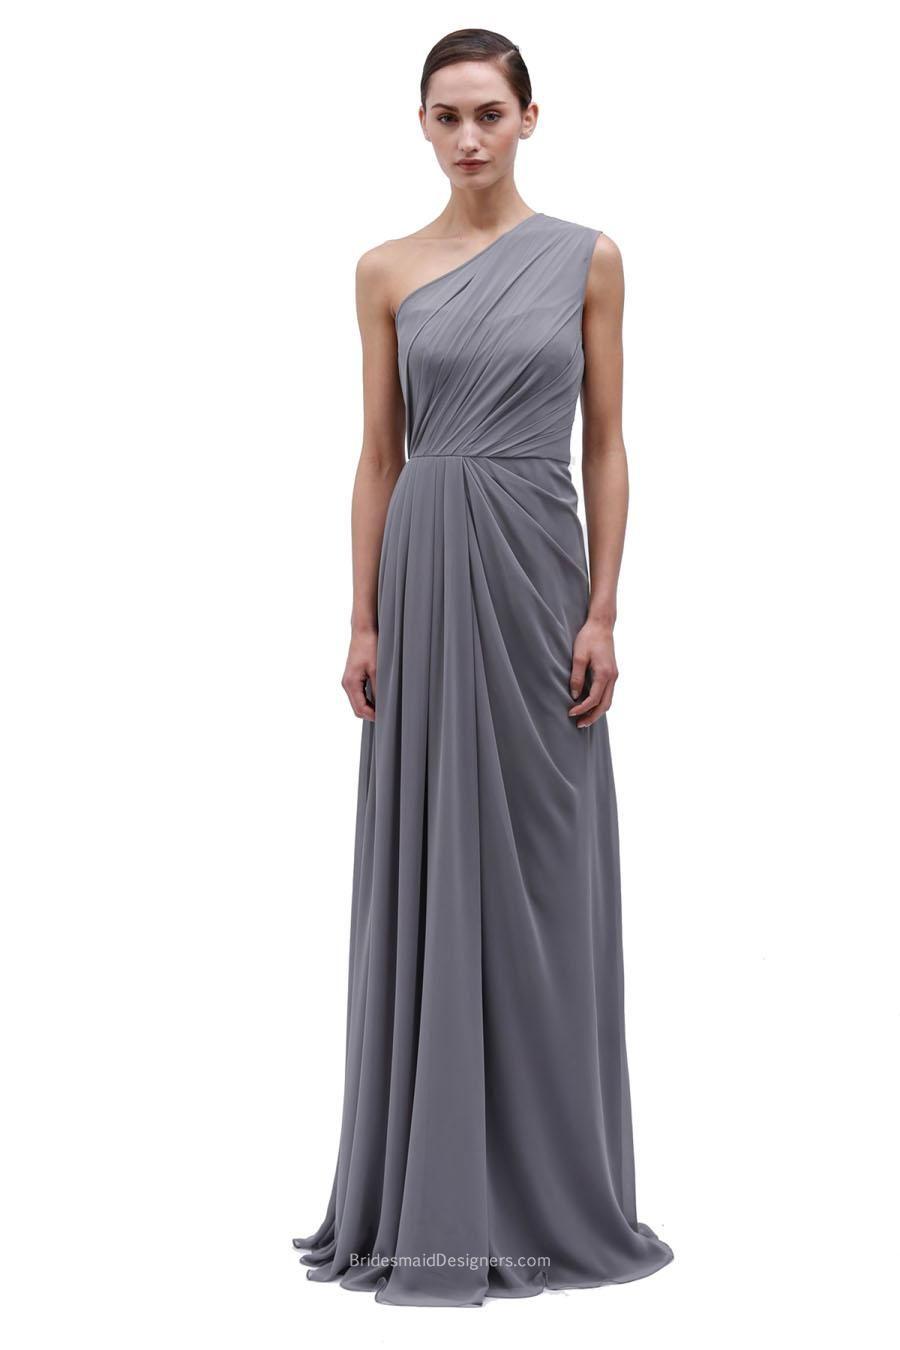 Hot sale long chiffon bridesmaid dress features one shoulder design